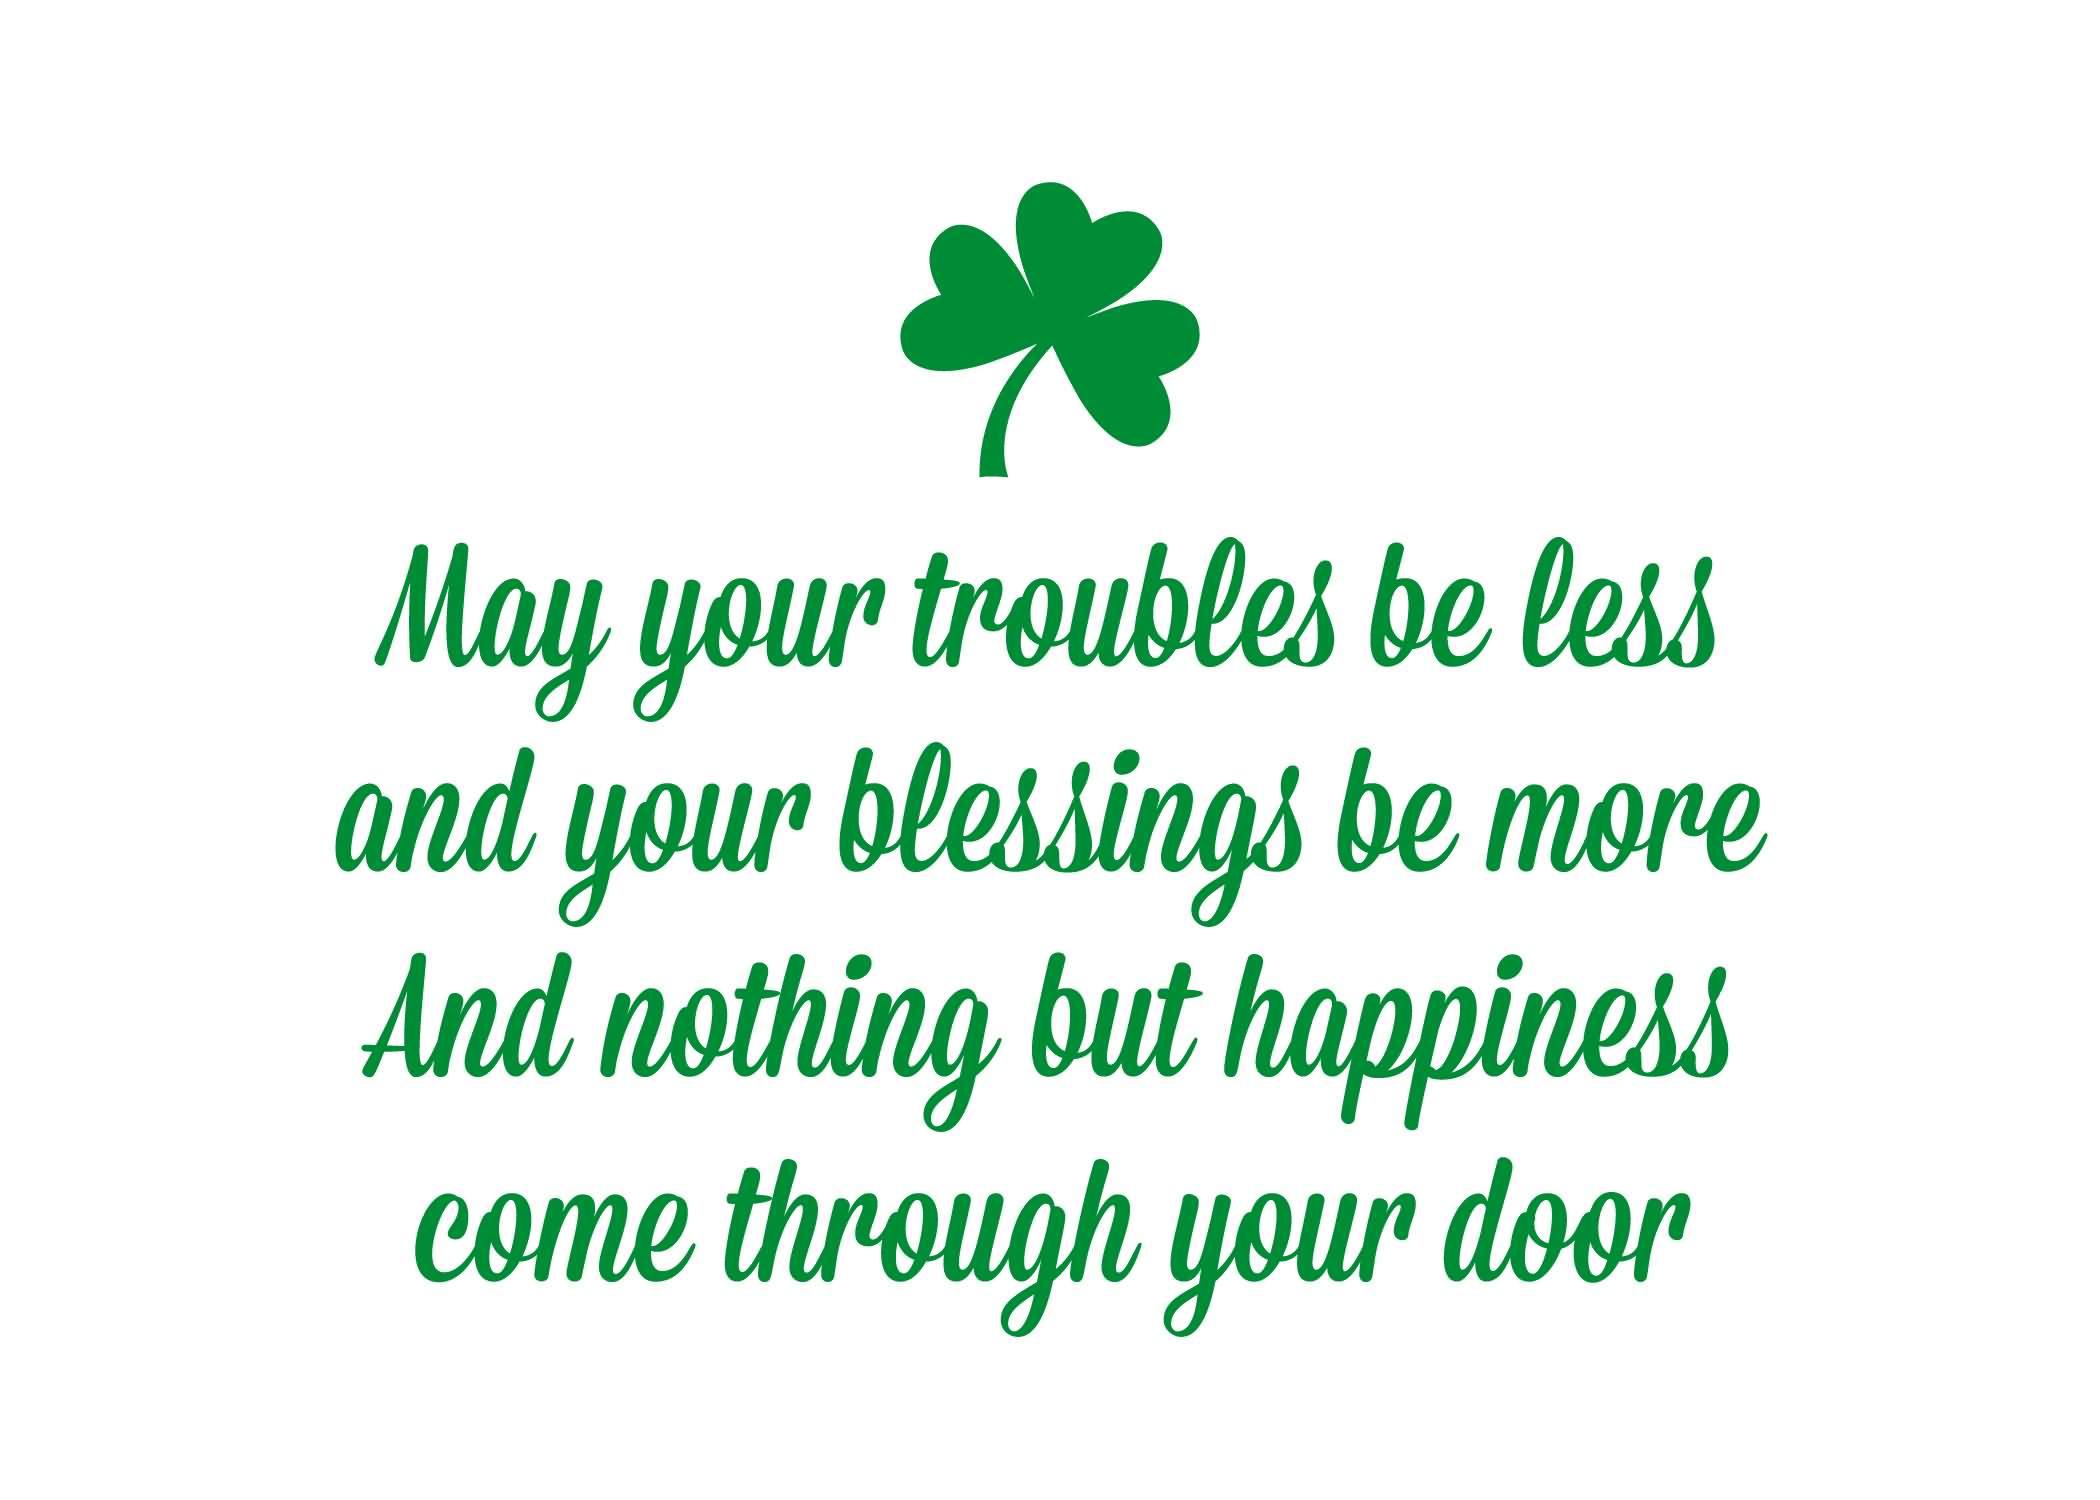 St. Patrick's Day Wish 11